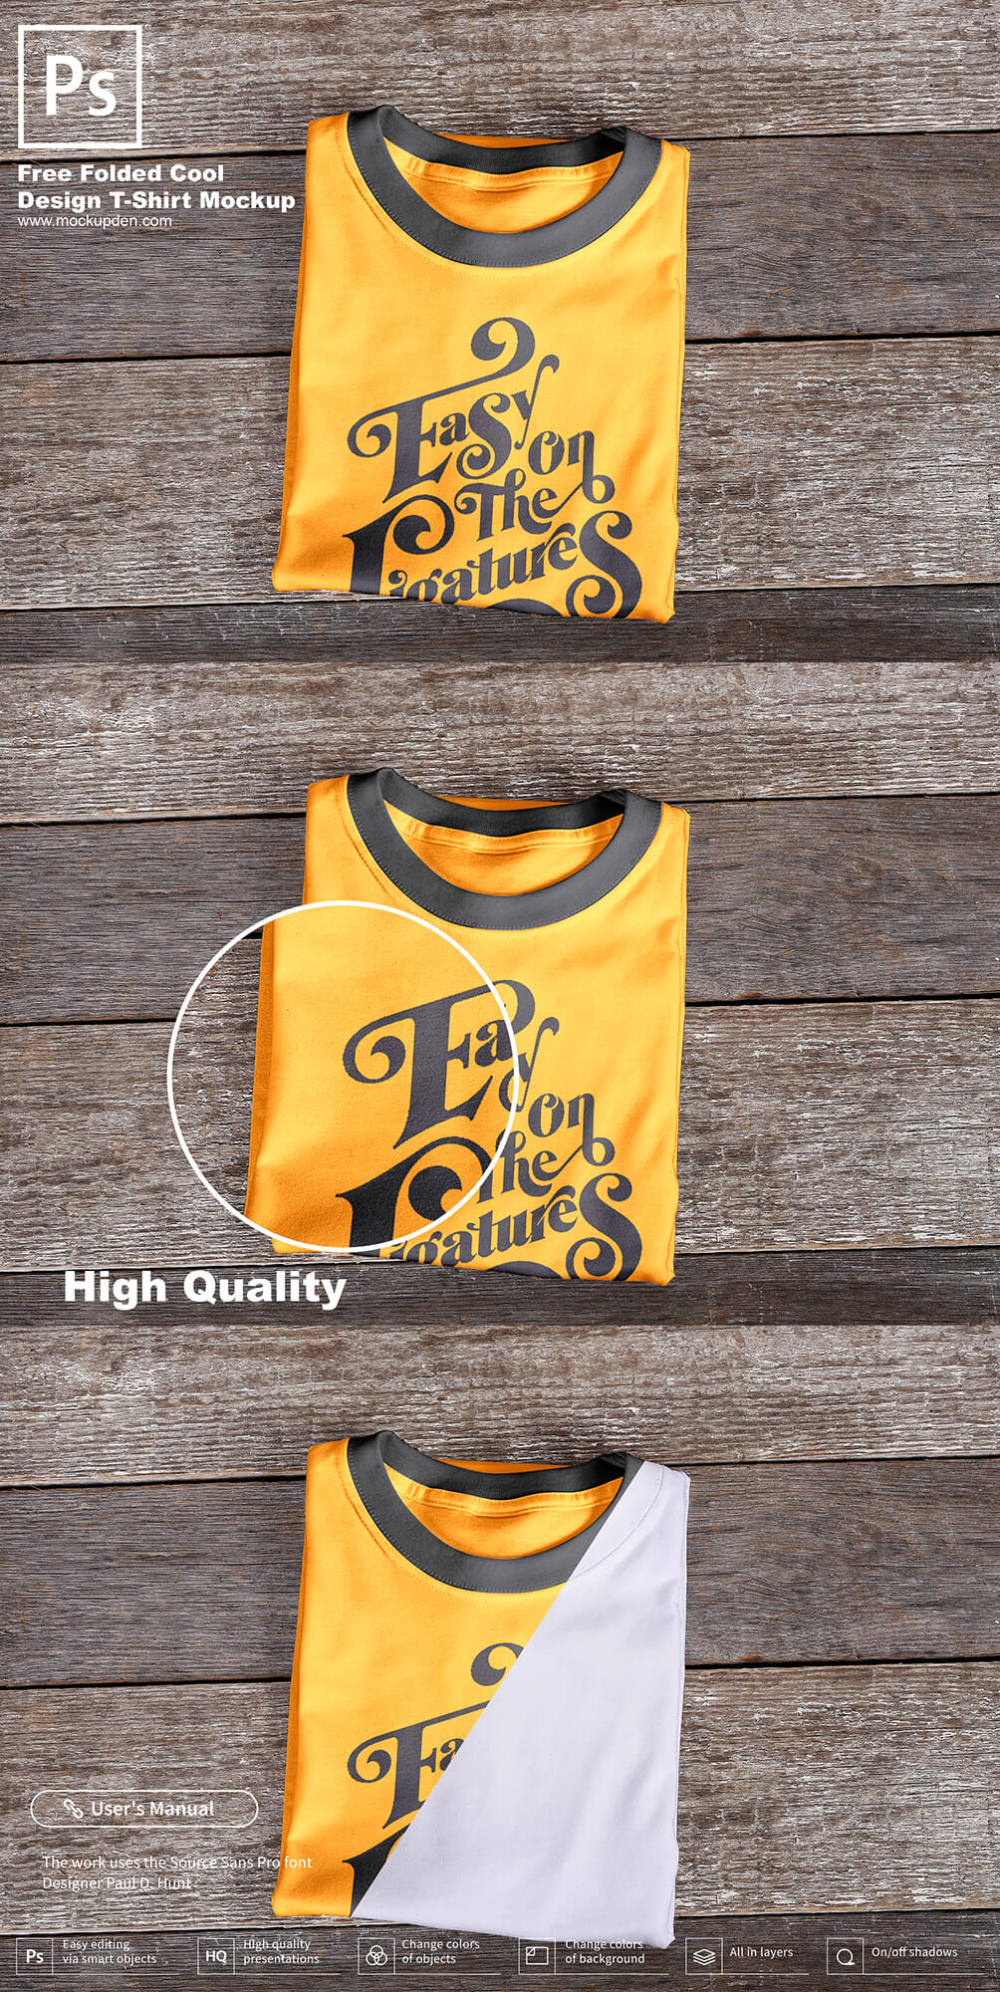 Download Free Folded Cool Design T Shirt Mockup Psd Template Shirt Mockup Tshirt Mockup Mockup